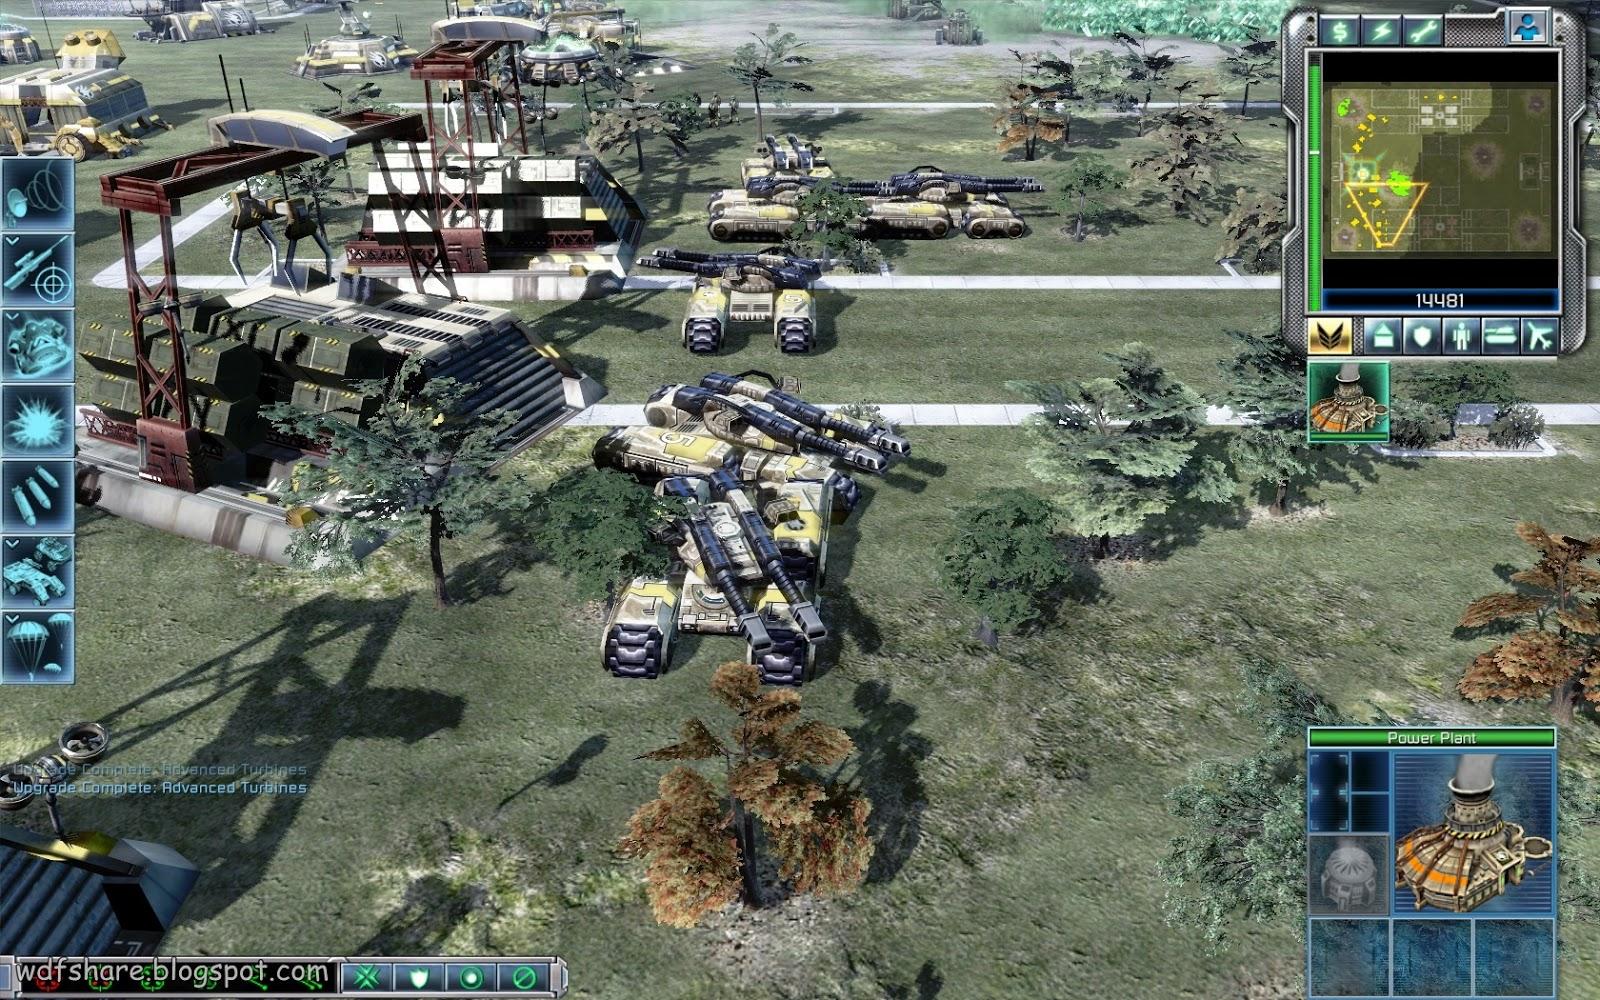 Command & Conquer 3 Tiberium Wars Free Download